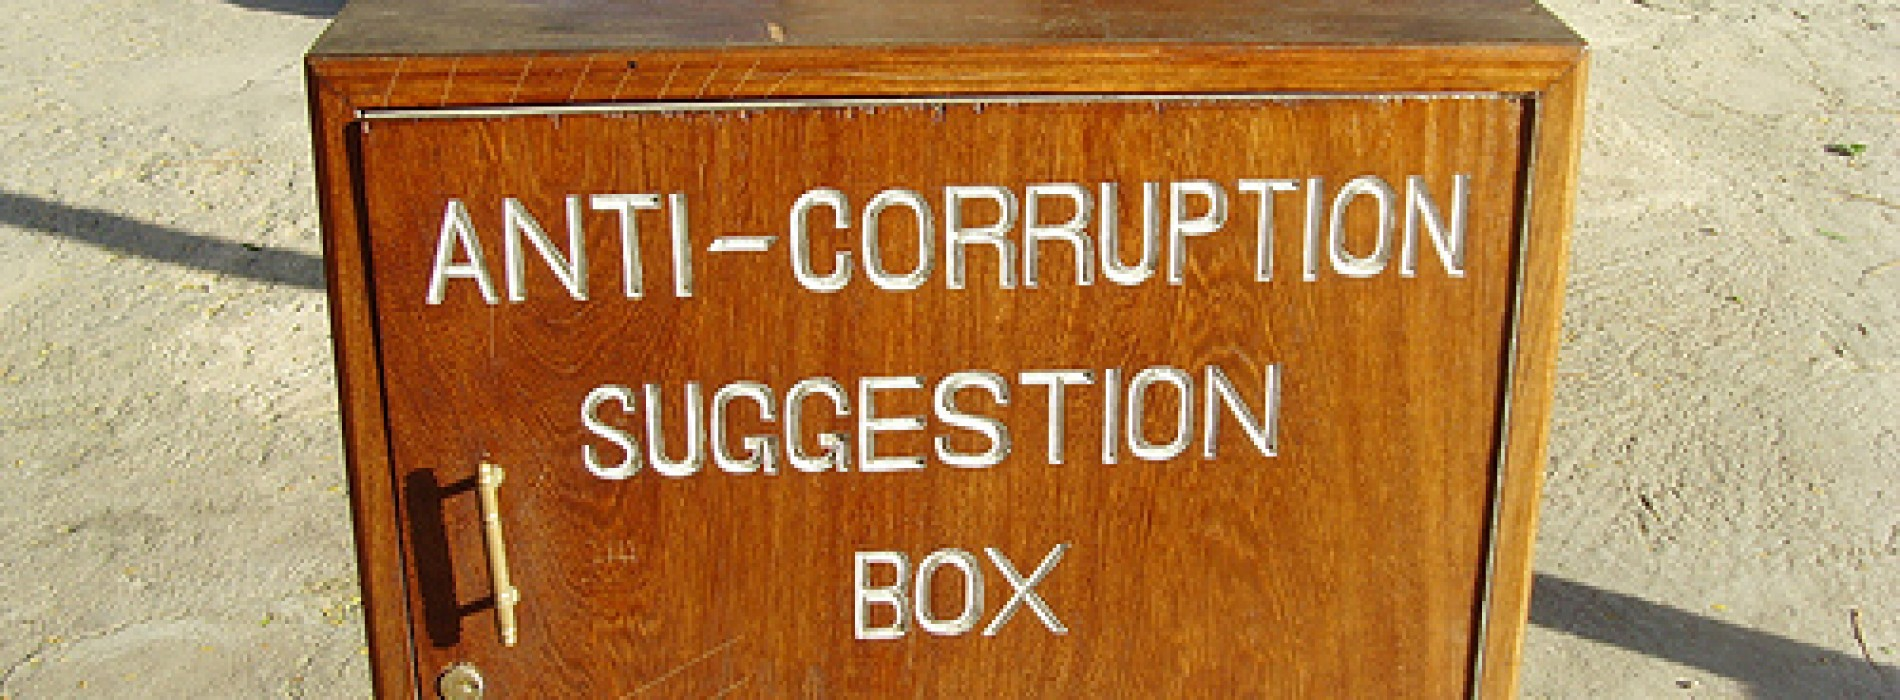 La corruzione in Africa